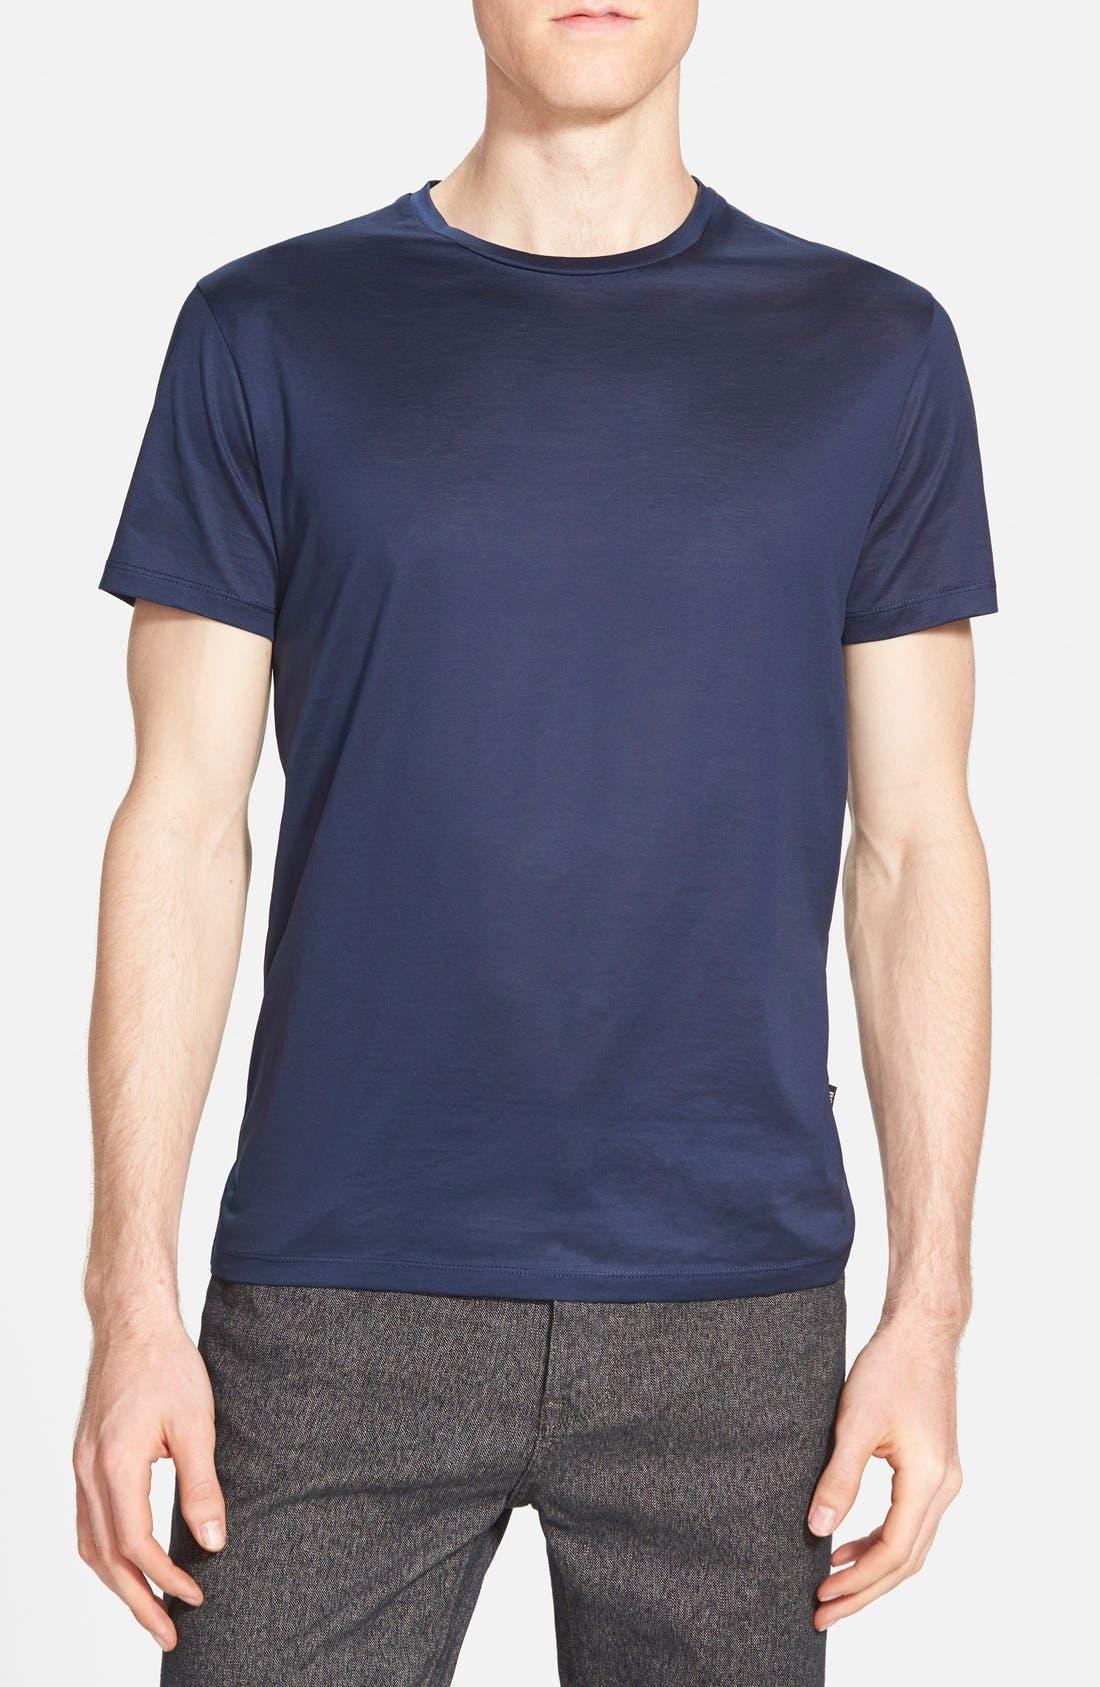 Alternate Image 1 Selected - BOSS HUGO BOSS 'Lecco' T-Shirt